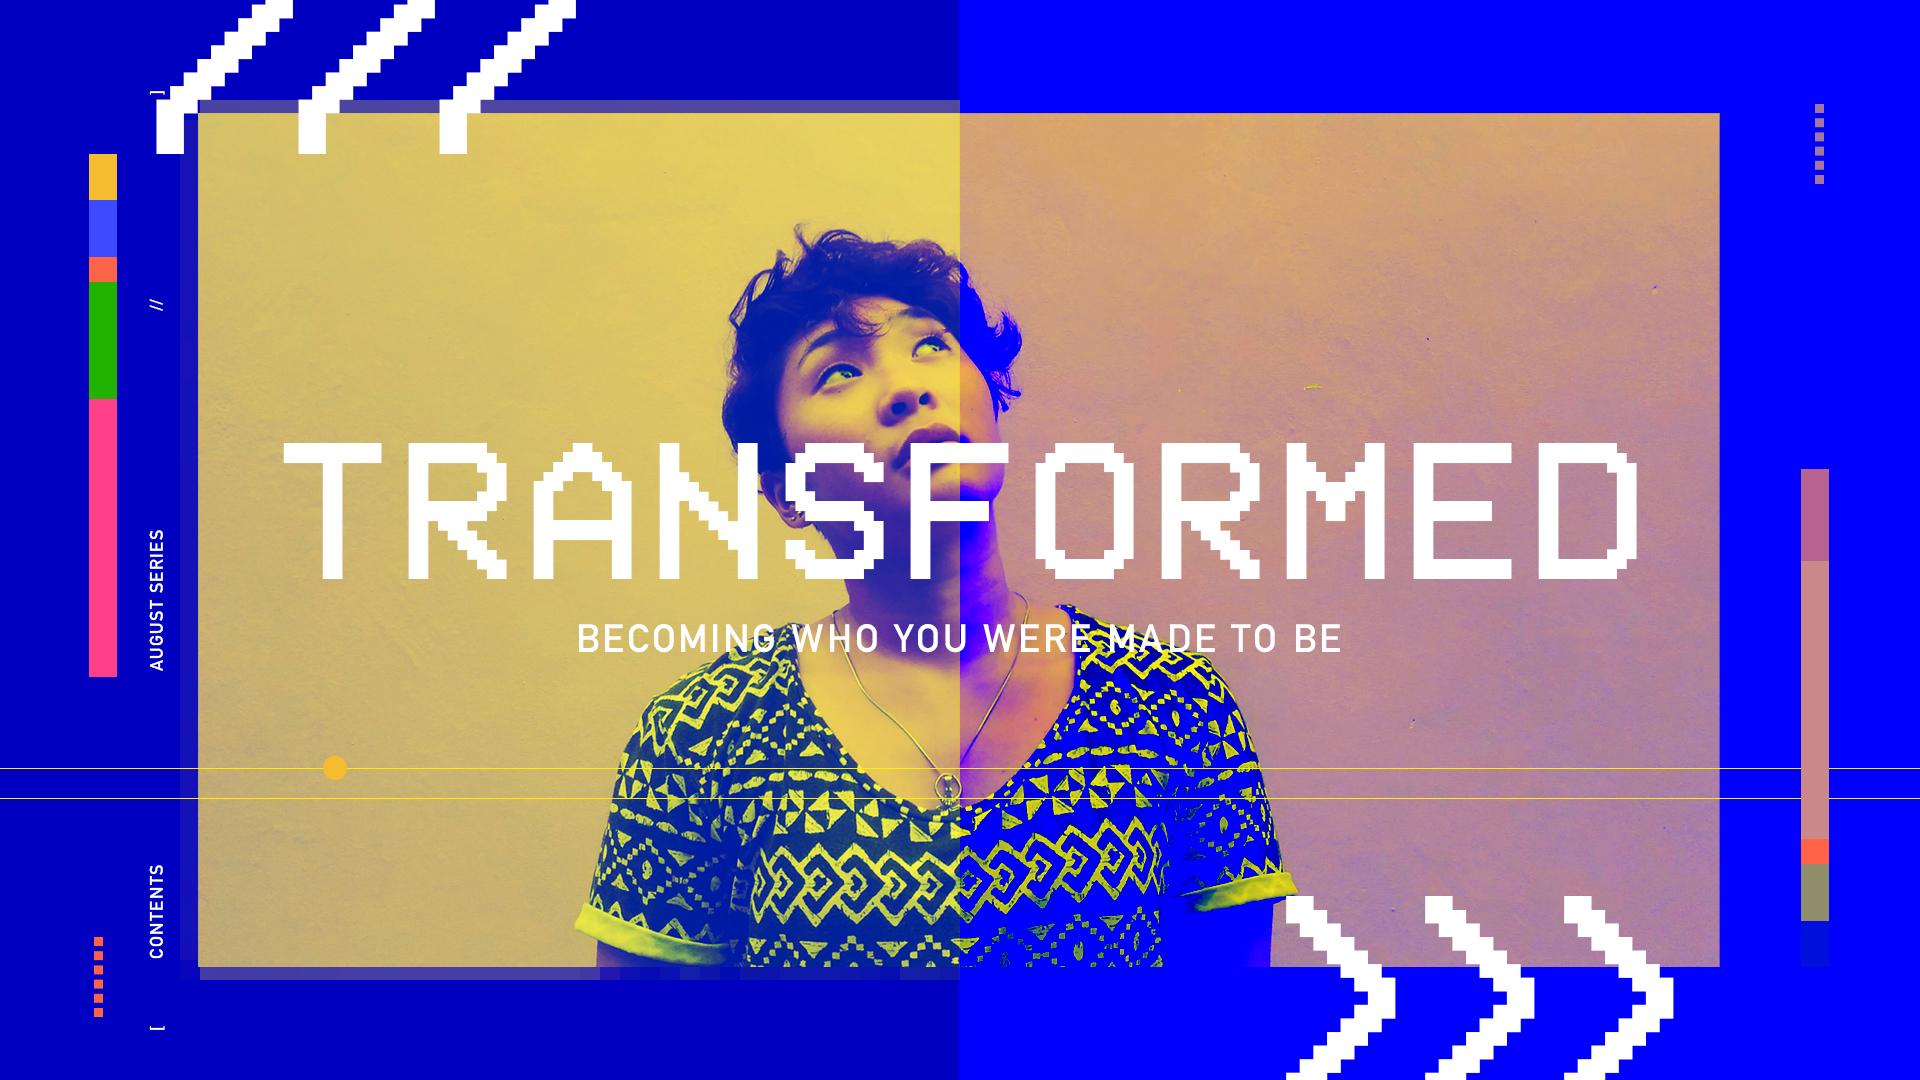 Transformed_OnScreen1920x1080.jpg